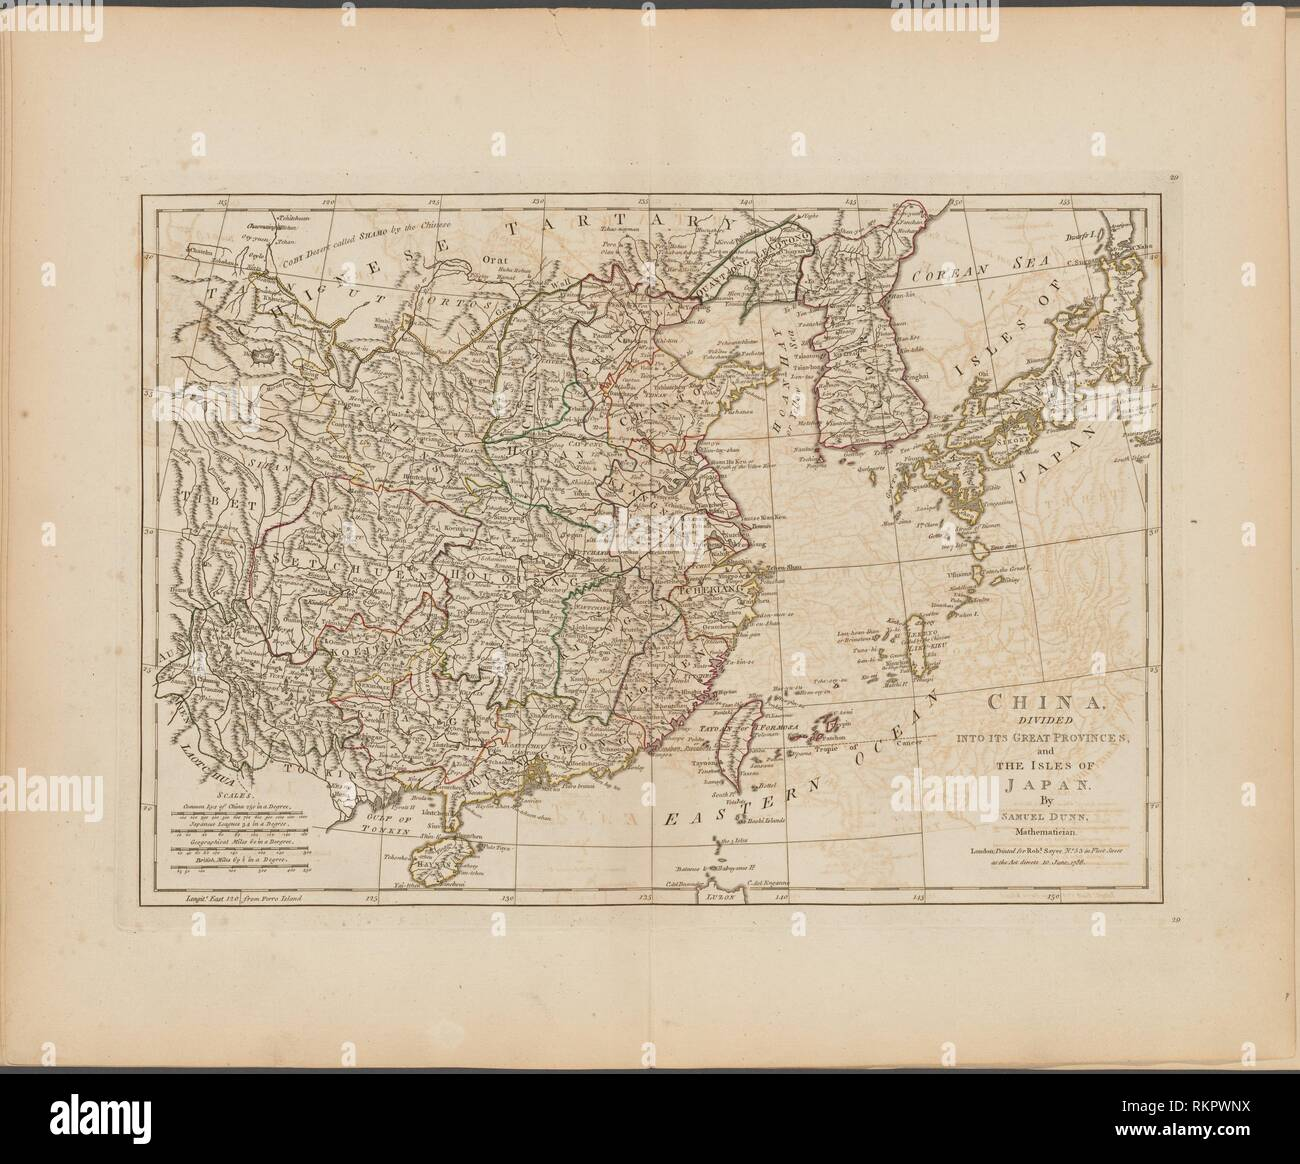 Map China Provinces Stock Photos & Map China Provinces Stock Images